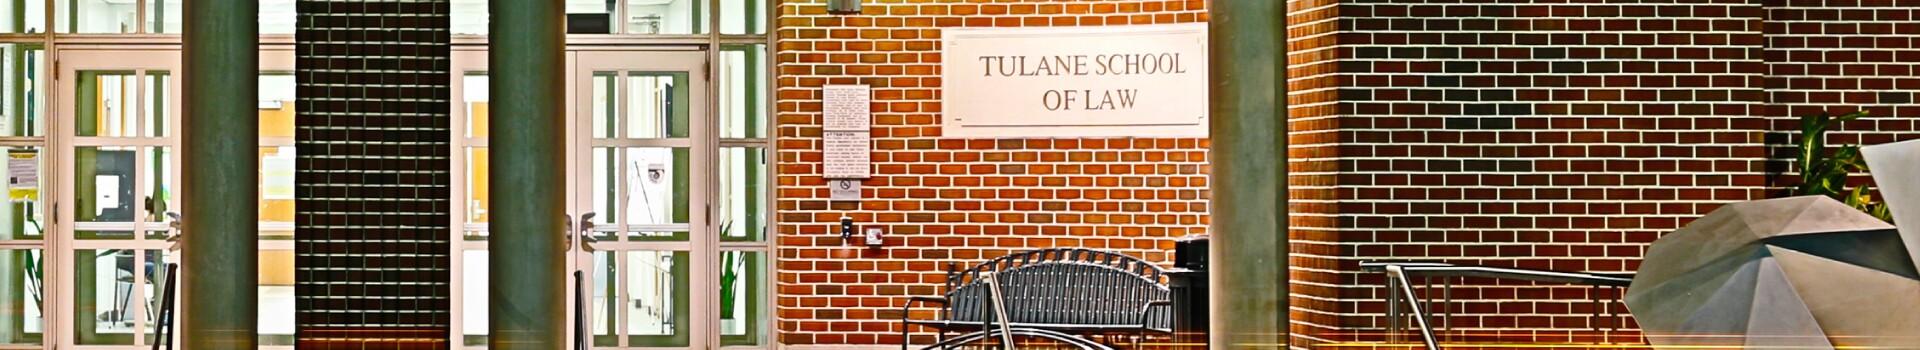 Tulane University Law School building